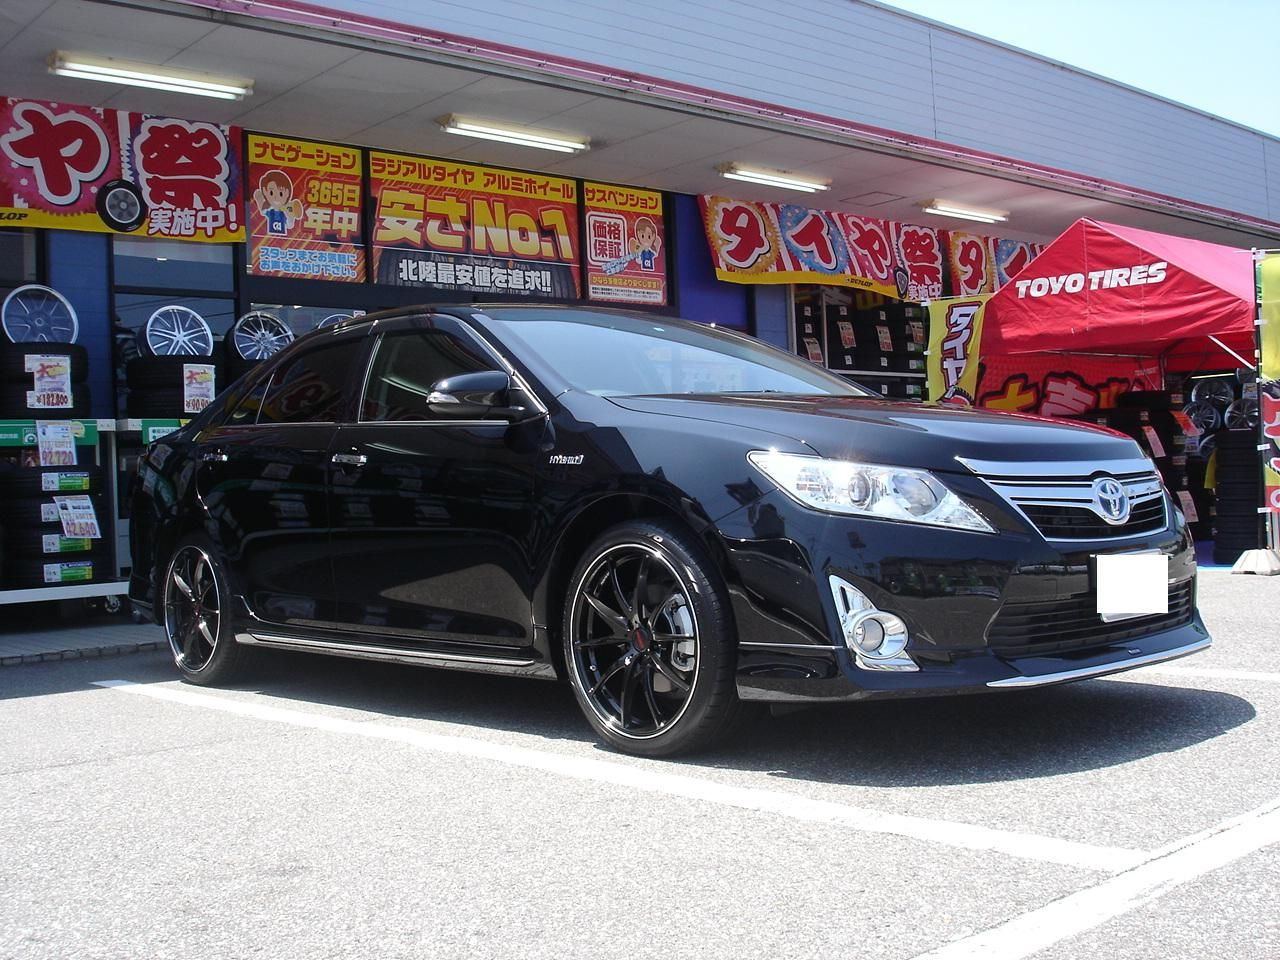 VX Diesel Automatic   LandCruiser 200   Toyota Australia